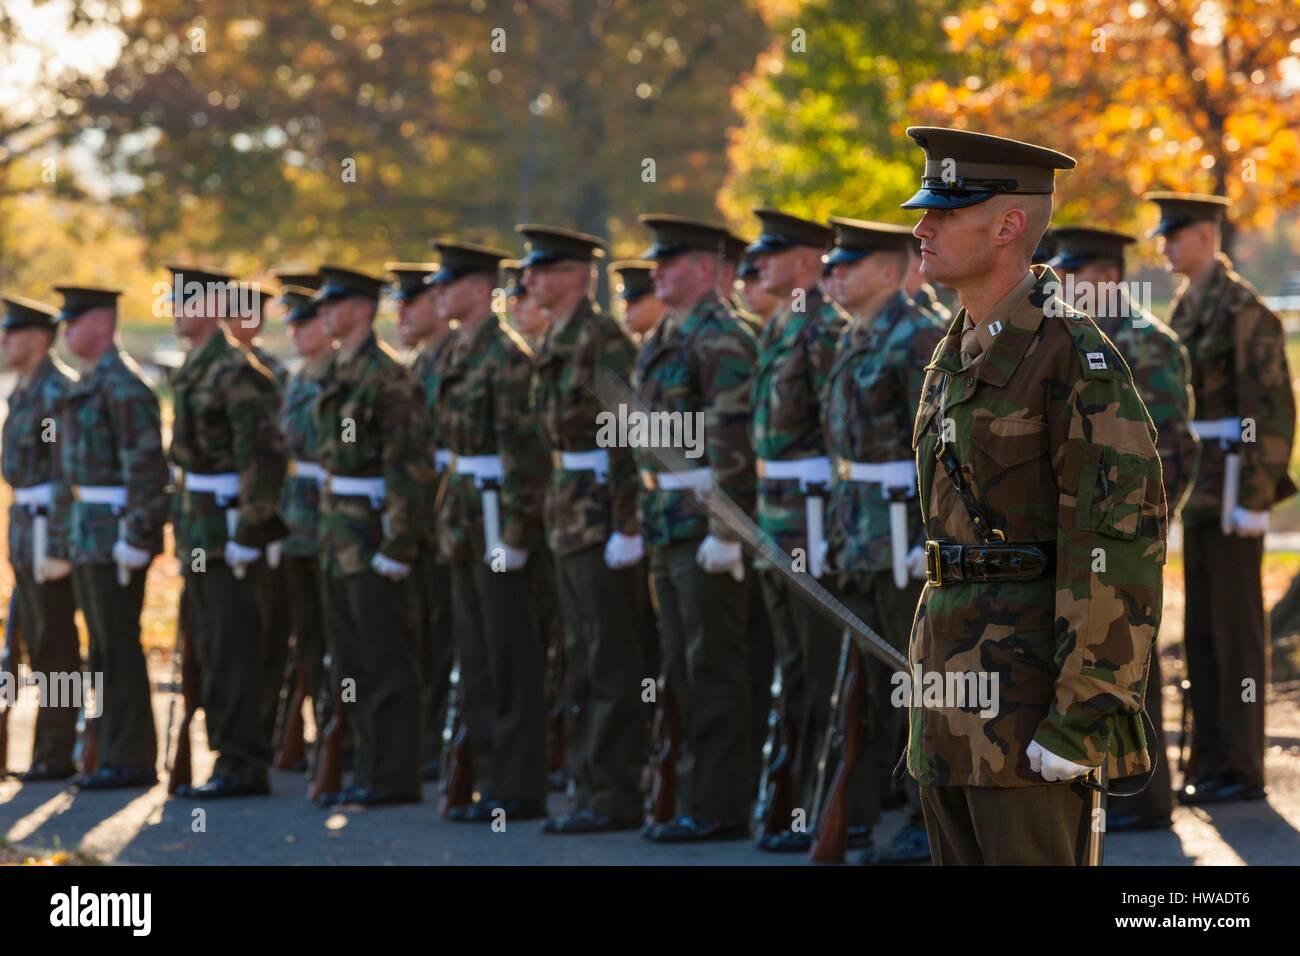 United States, Virginia, Arlington, US Marines by the Iwo Jima Memorial - Stock Image